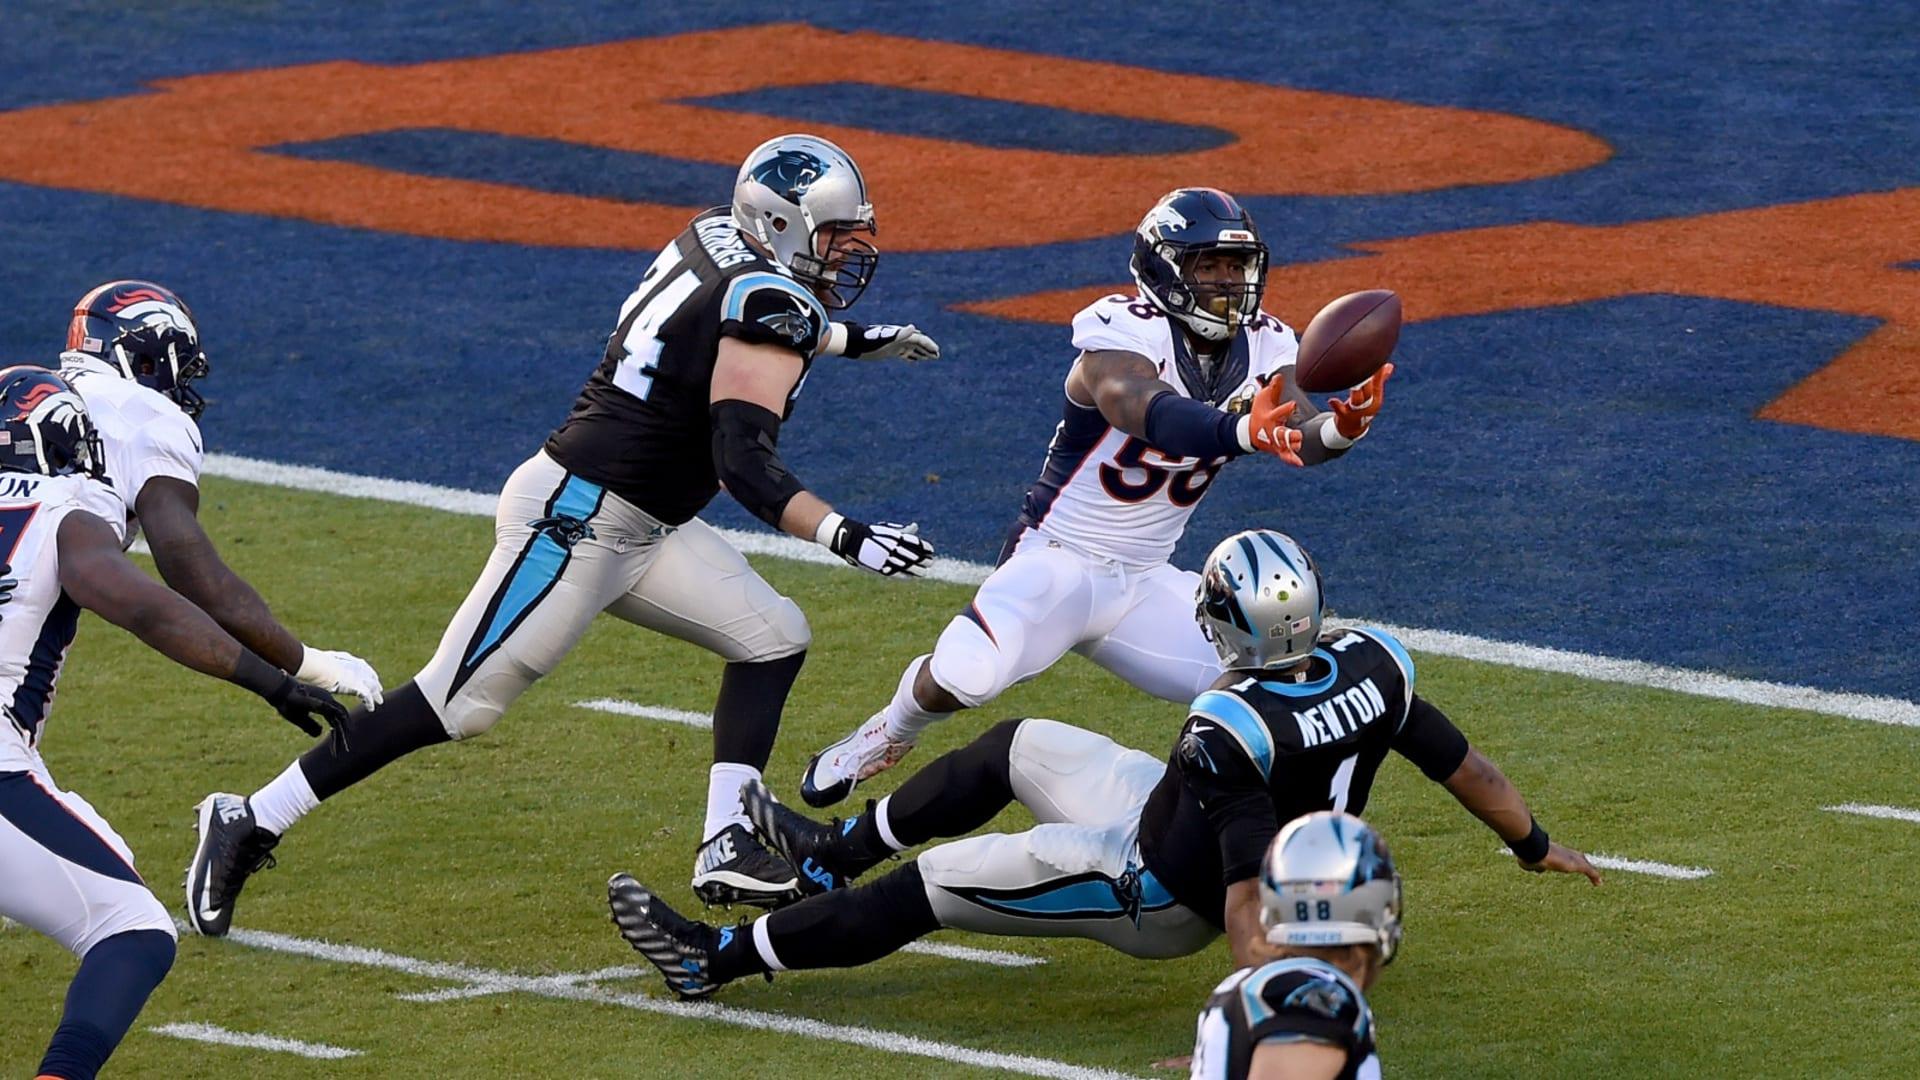 Denver Broncos edge rusher Von Miller